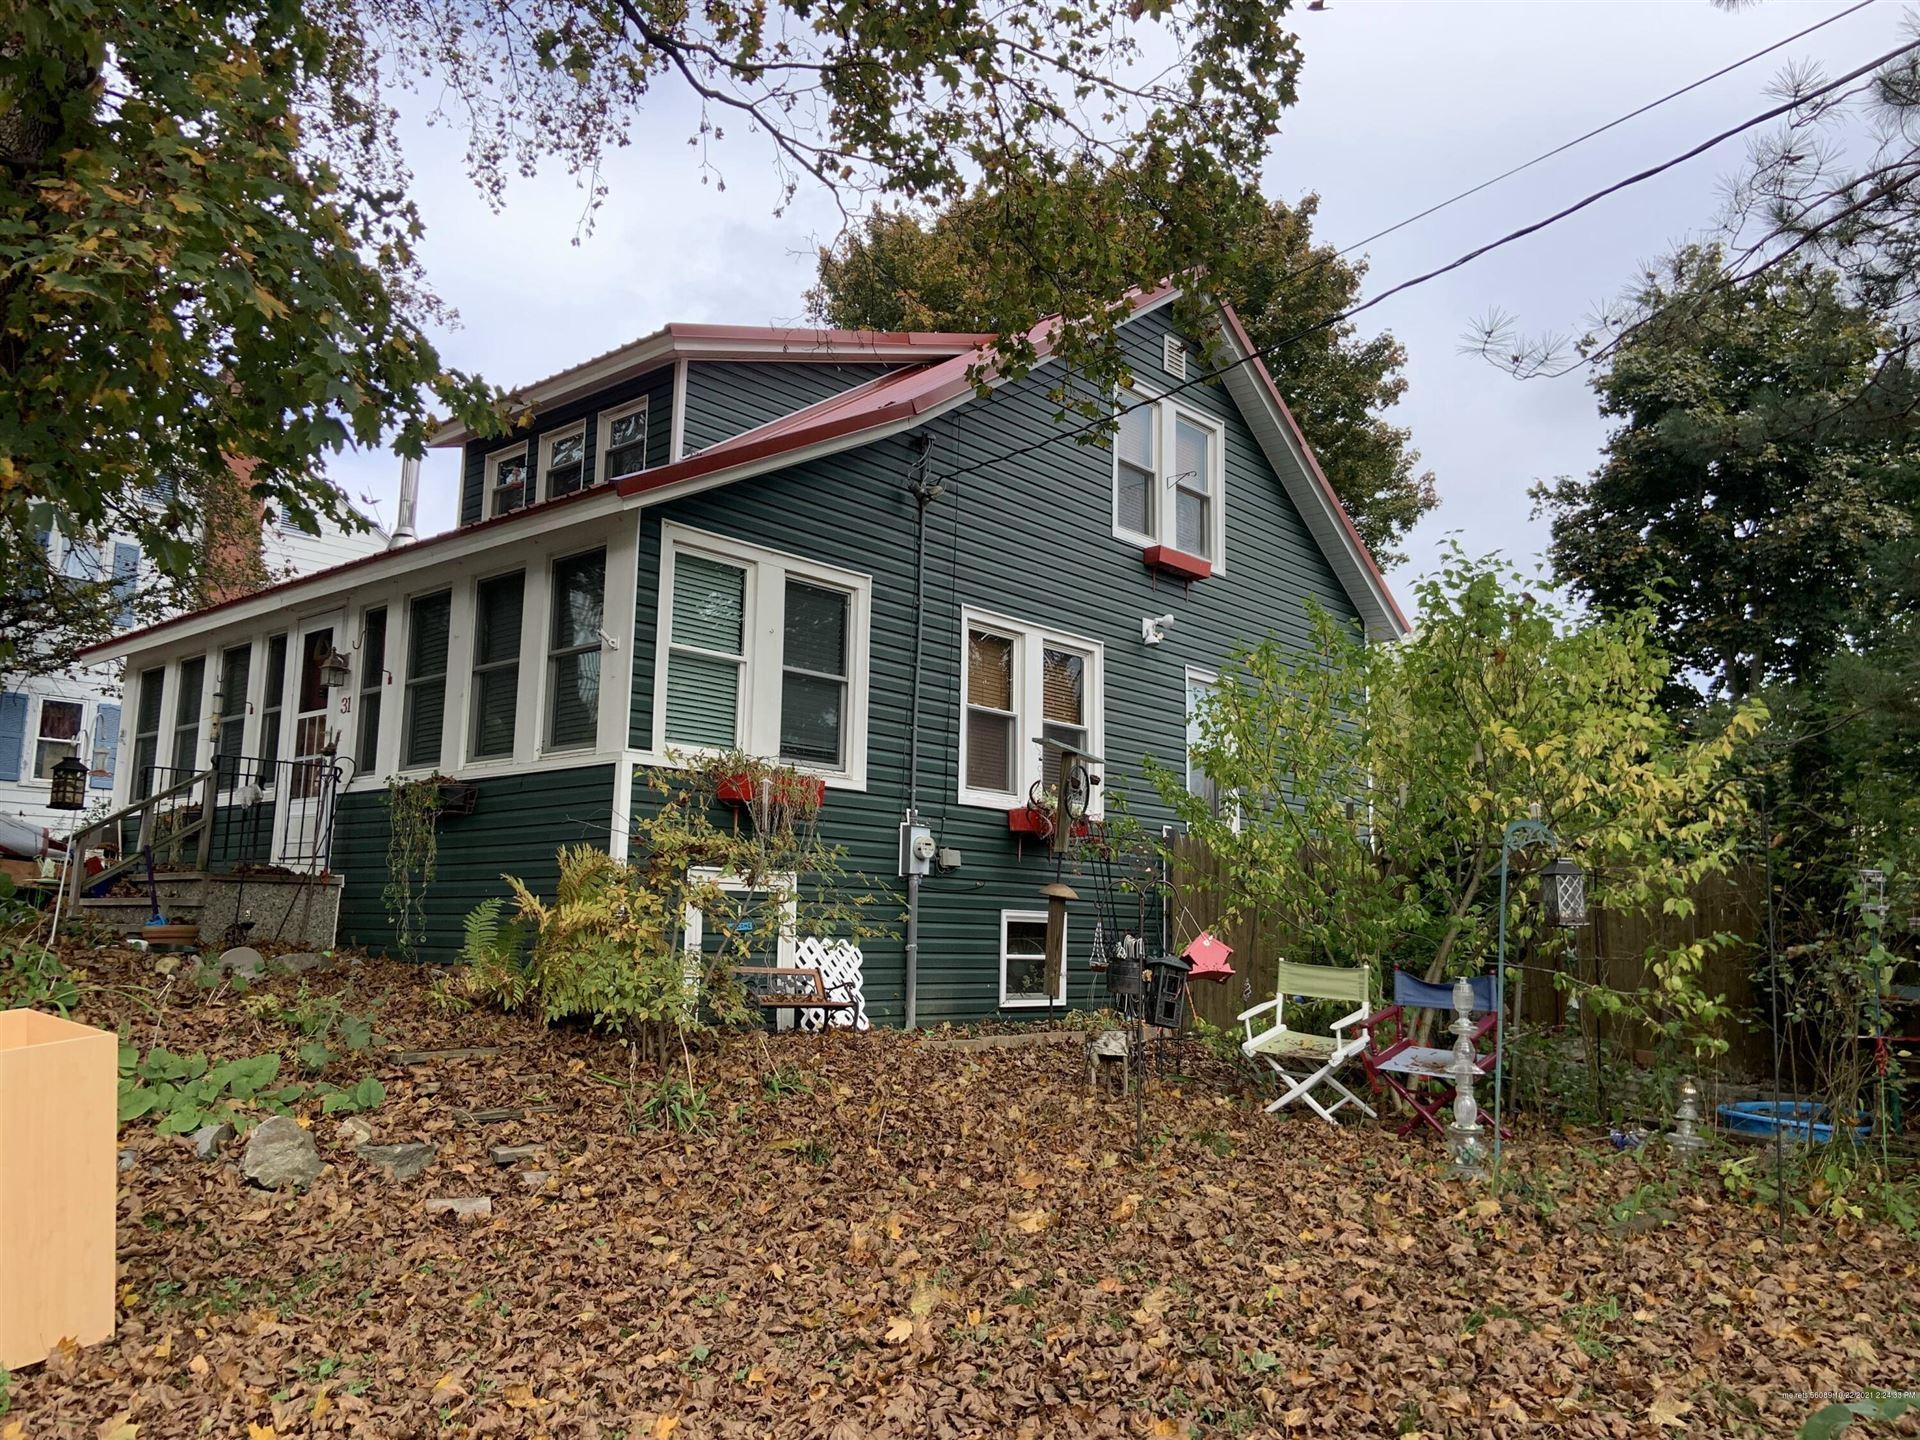 Photo of 31 Bemis Street, Livermore Falls, ME 04254 (MLS # 1512873)